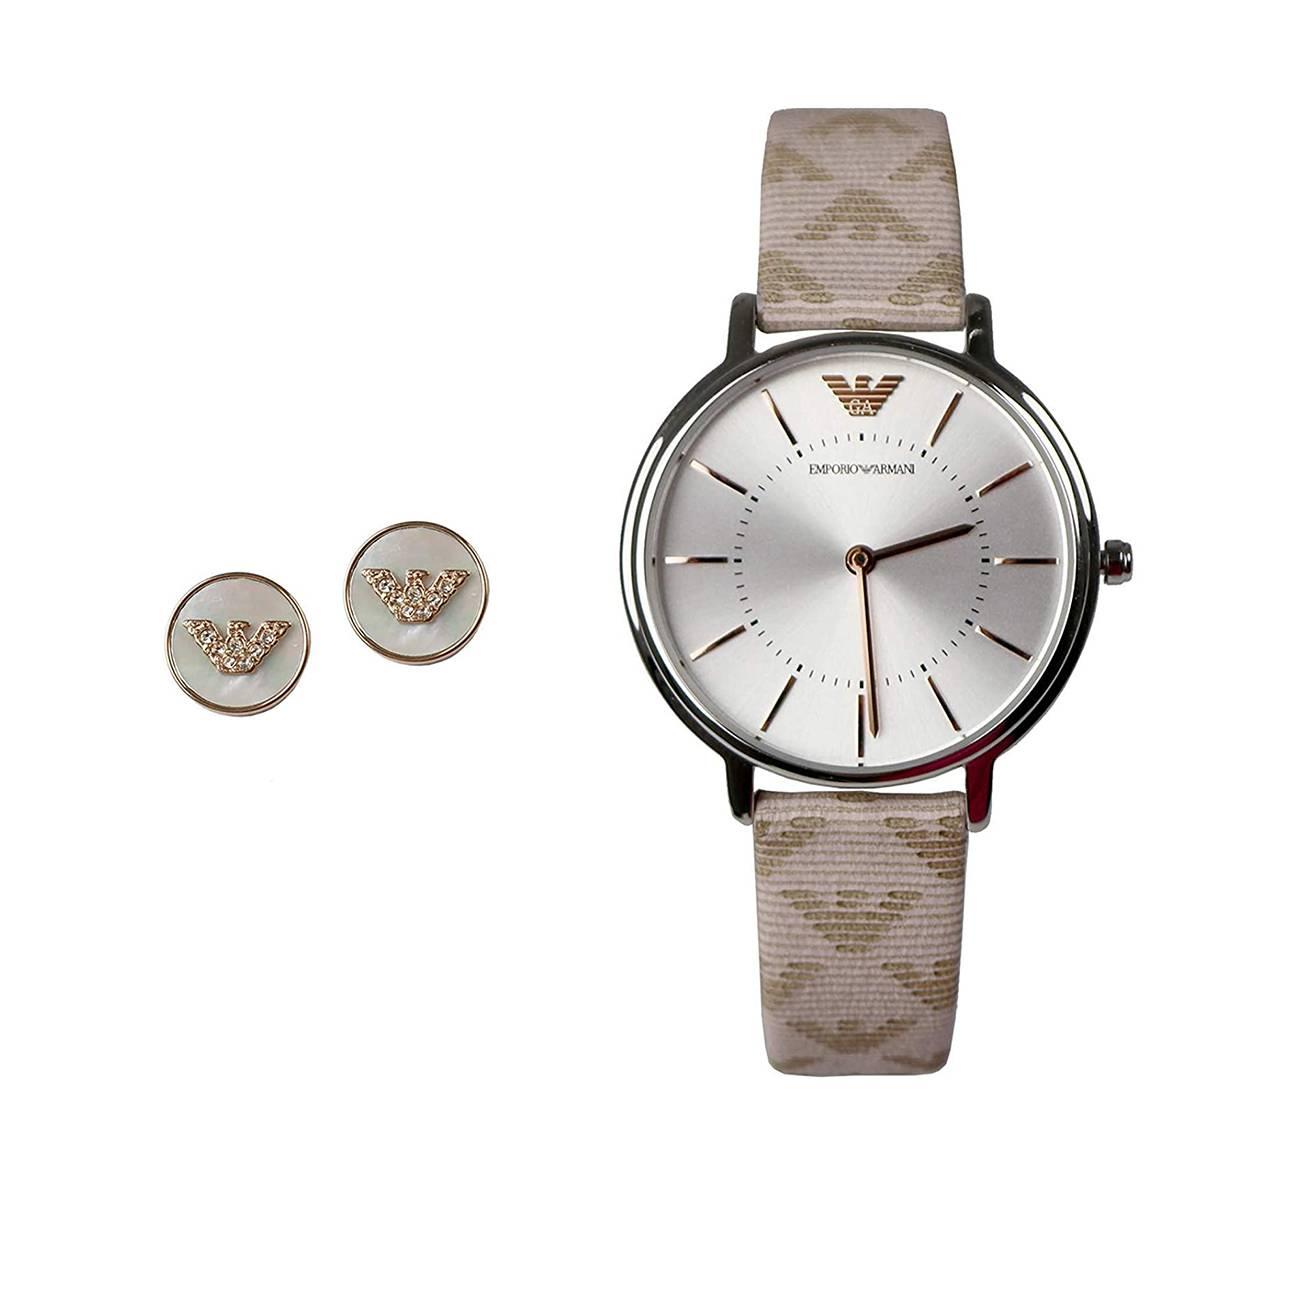 AR80007 Wristwatch Earnings Ladies Gift Set imagine produs